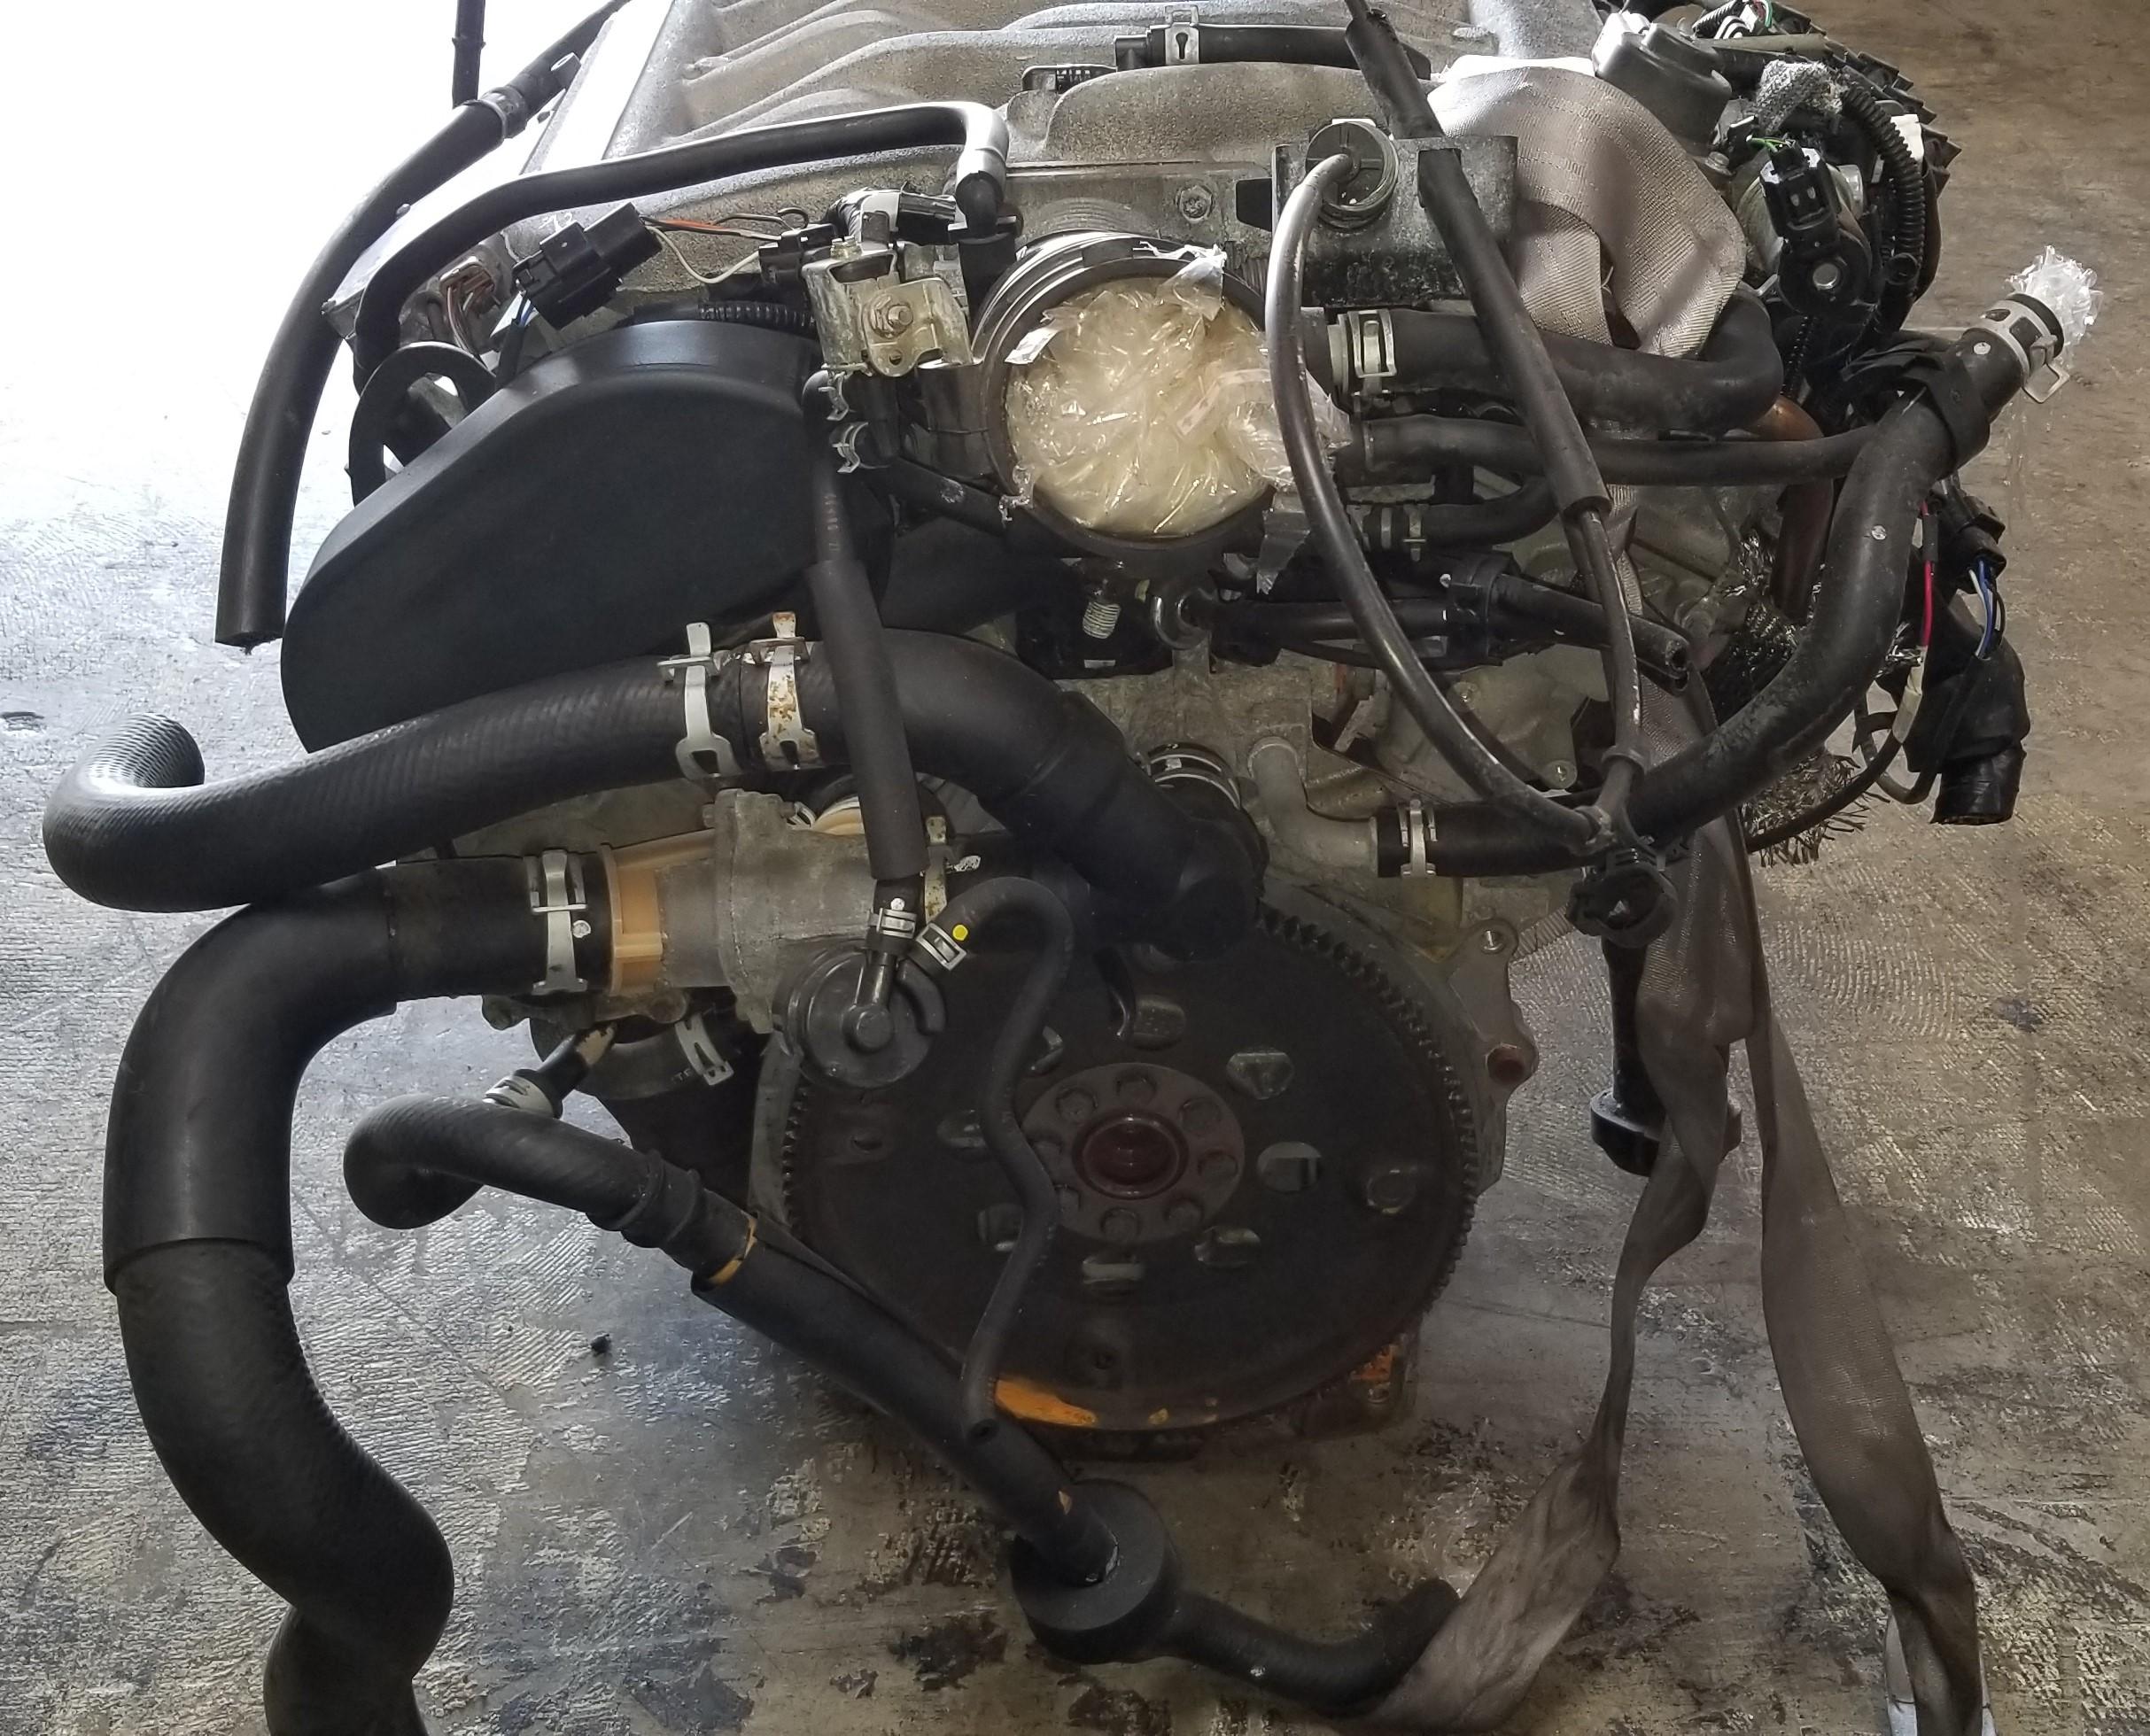 Nissan Chula Vista >> GY-DE 1999-2001 JDM Mazda MPV GY-DE 2.5L V6 Engine | JDM Of San Diego